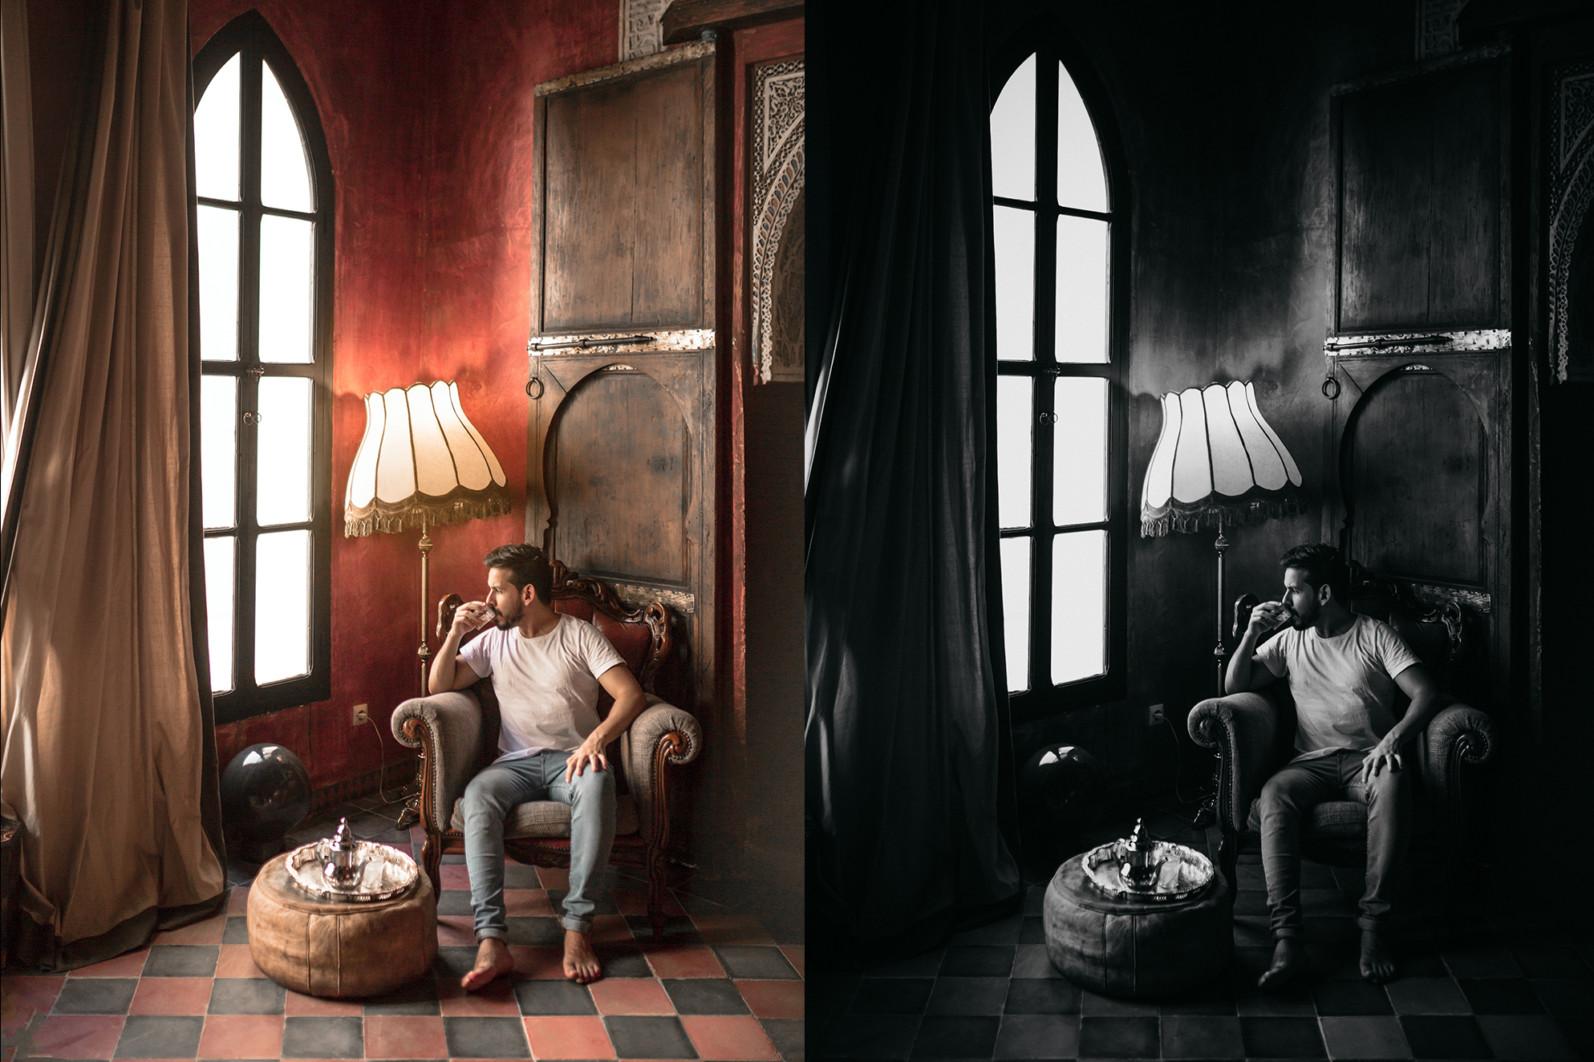 15 x Lightroom Presets, Monochrome Men Presets, Black and White Presets, Portrait Presets - 12 Monochrome Men 12 -